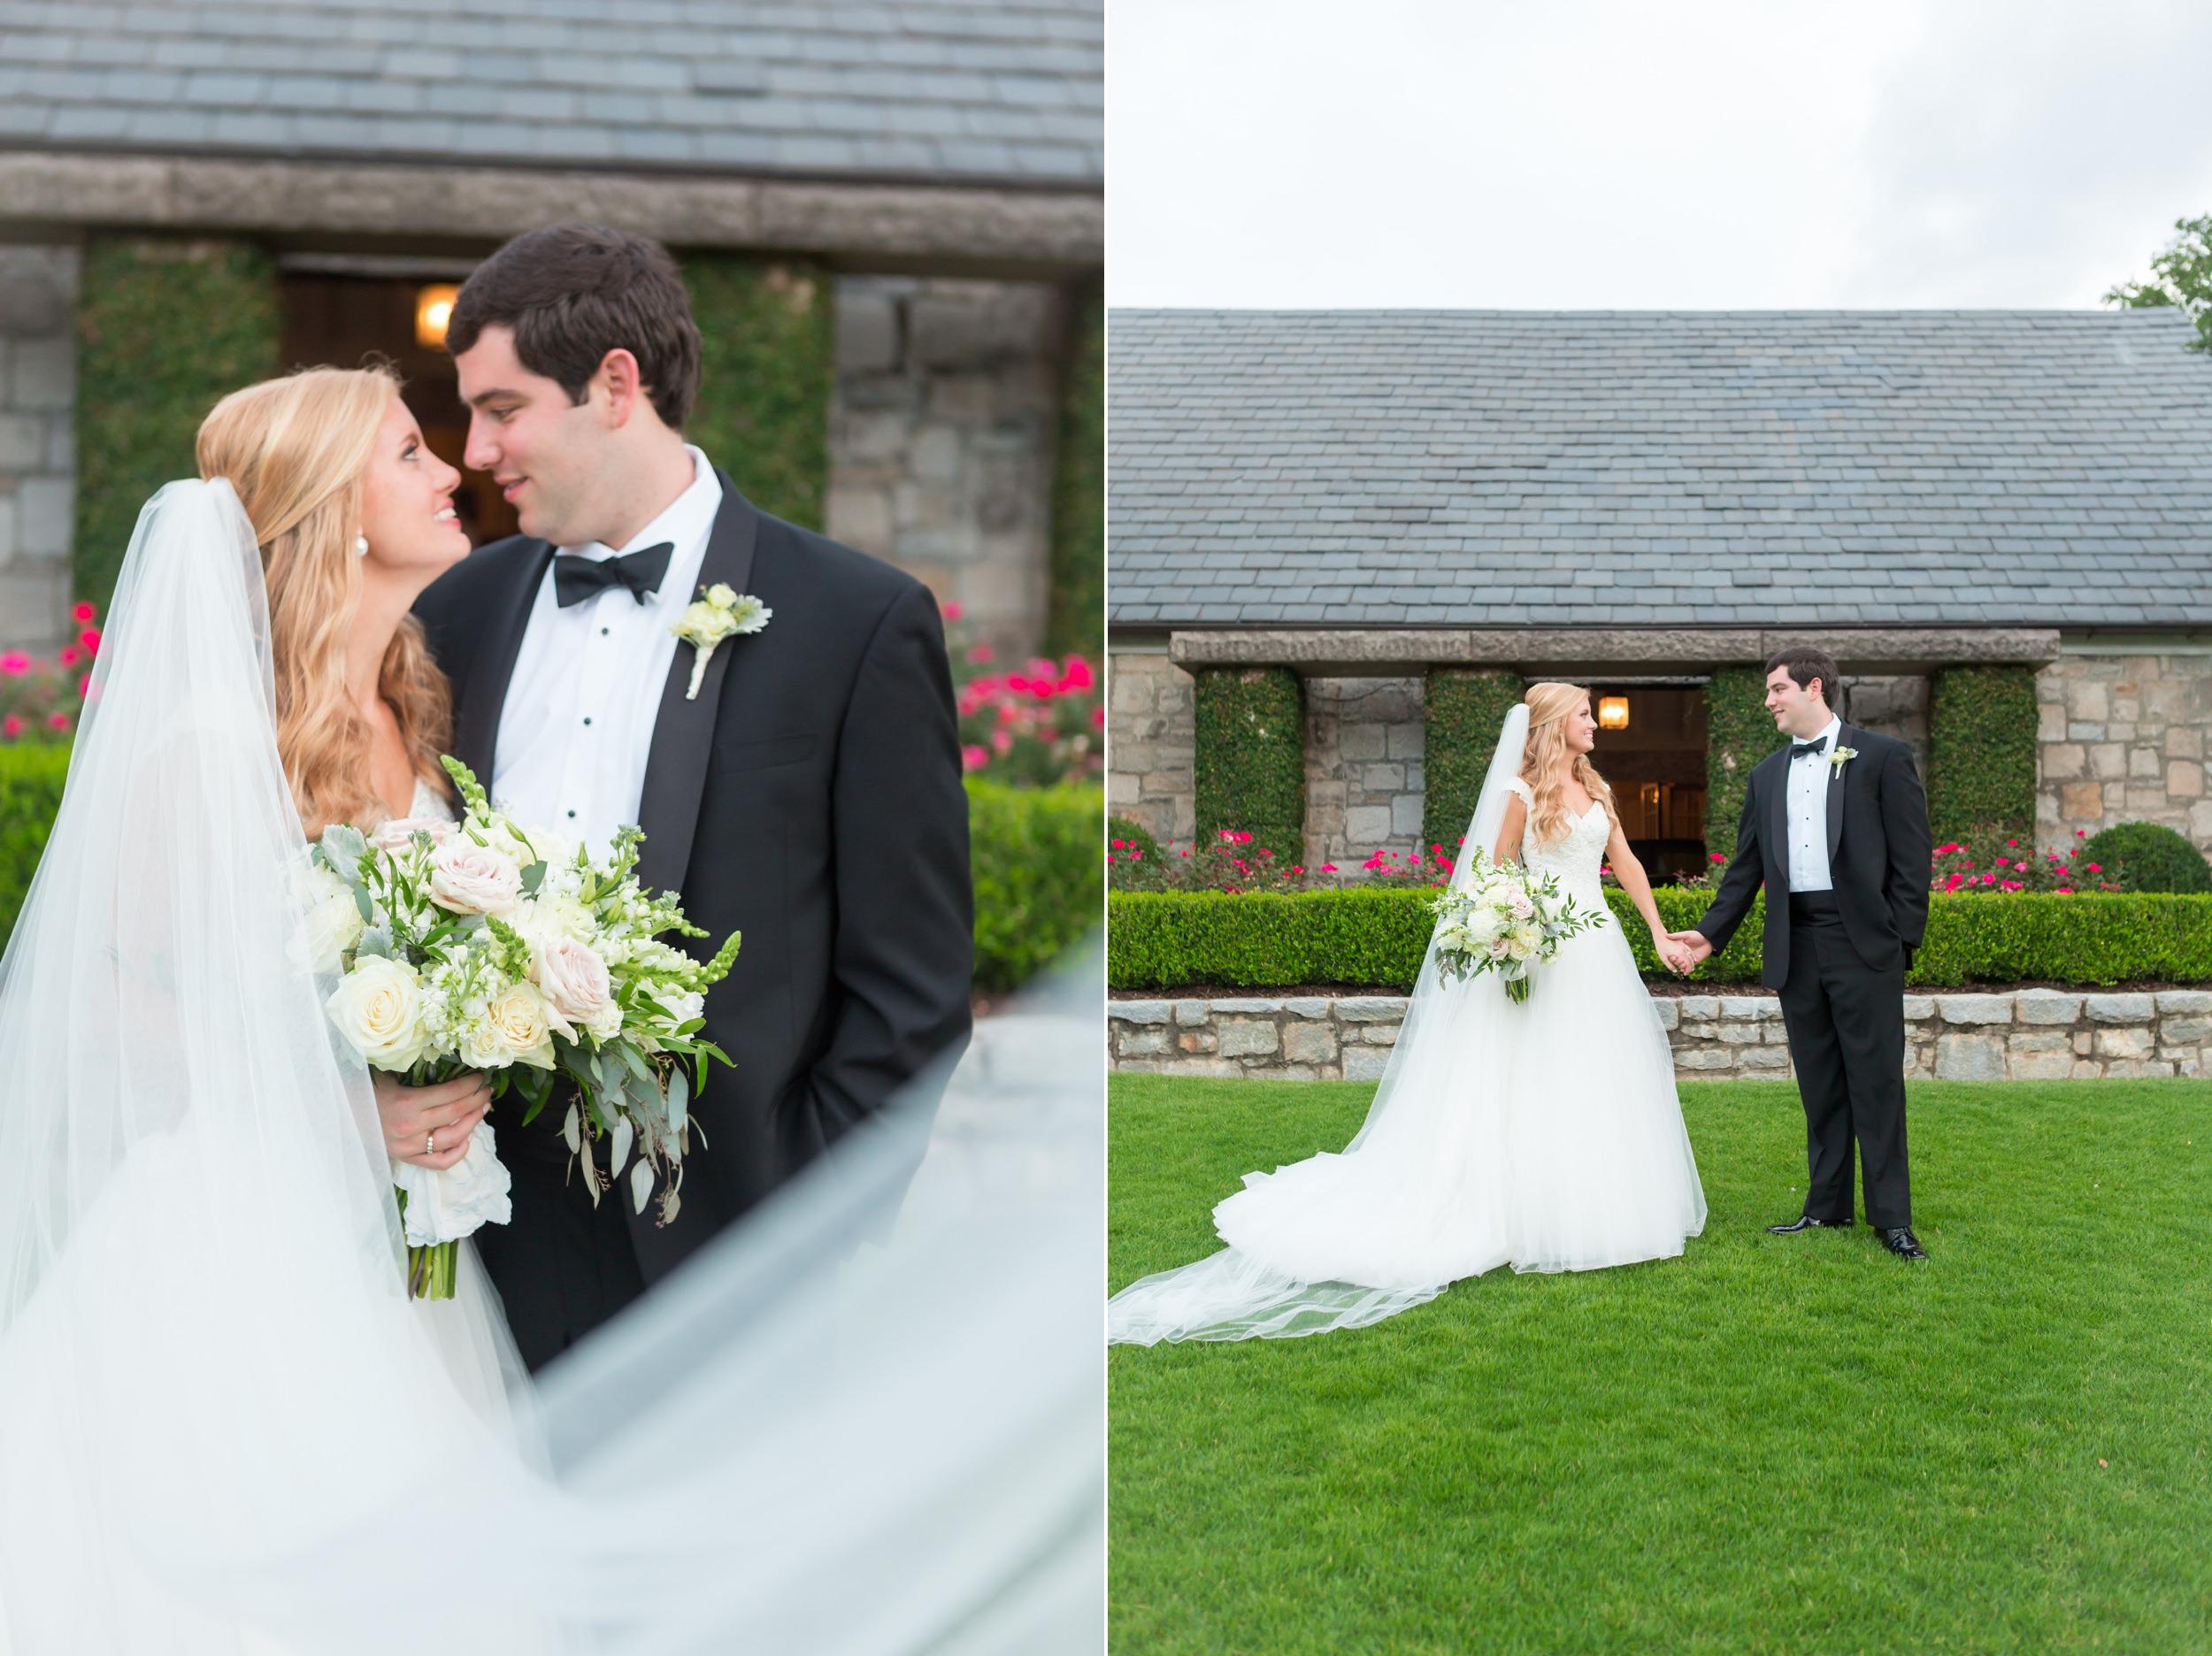 Piedmont-Driving-Club-Wedding-Photos032.jpg